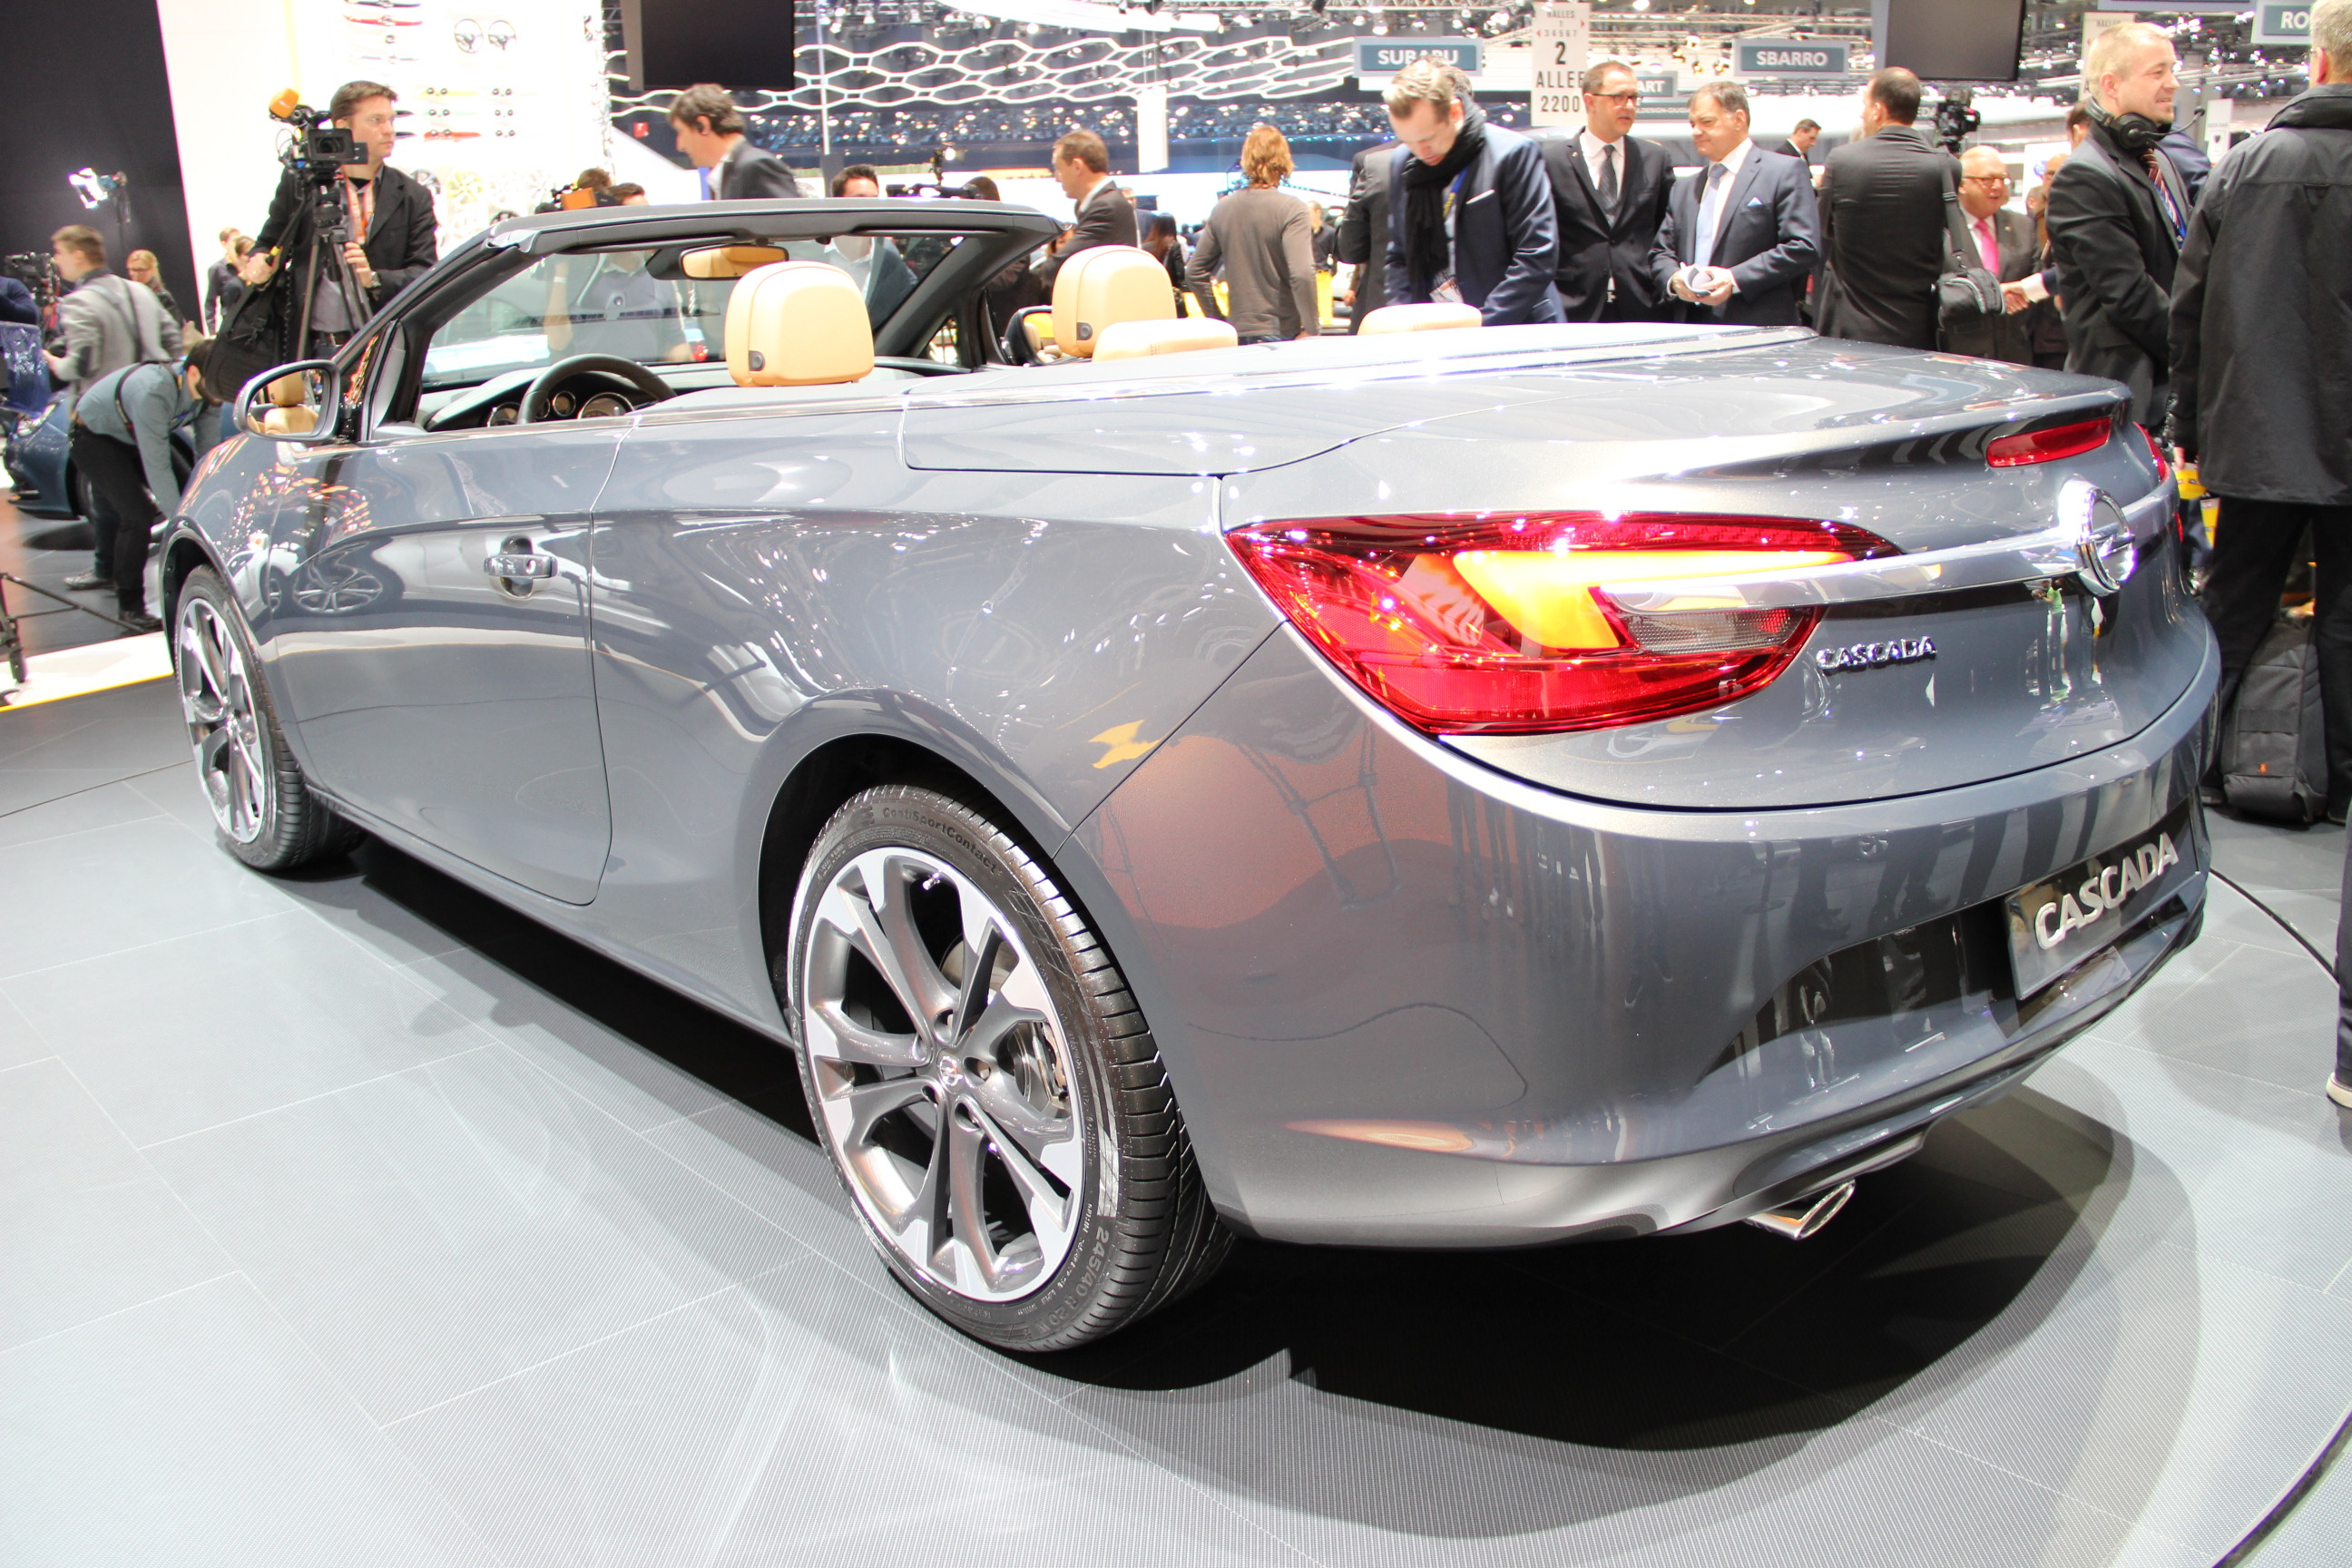 http://images.caradisiac.com/images/4/8/8/0/84880/S0-En-direct-de-Geneve-2013-Opel-Cascada-jolie-287015.jpg